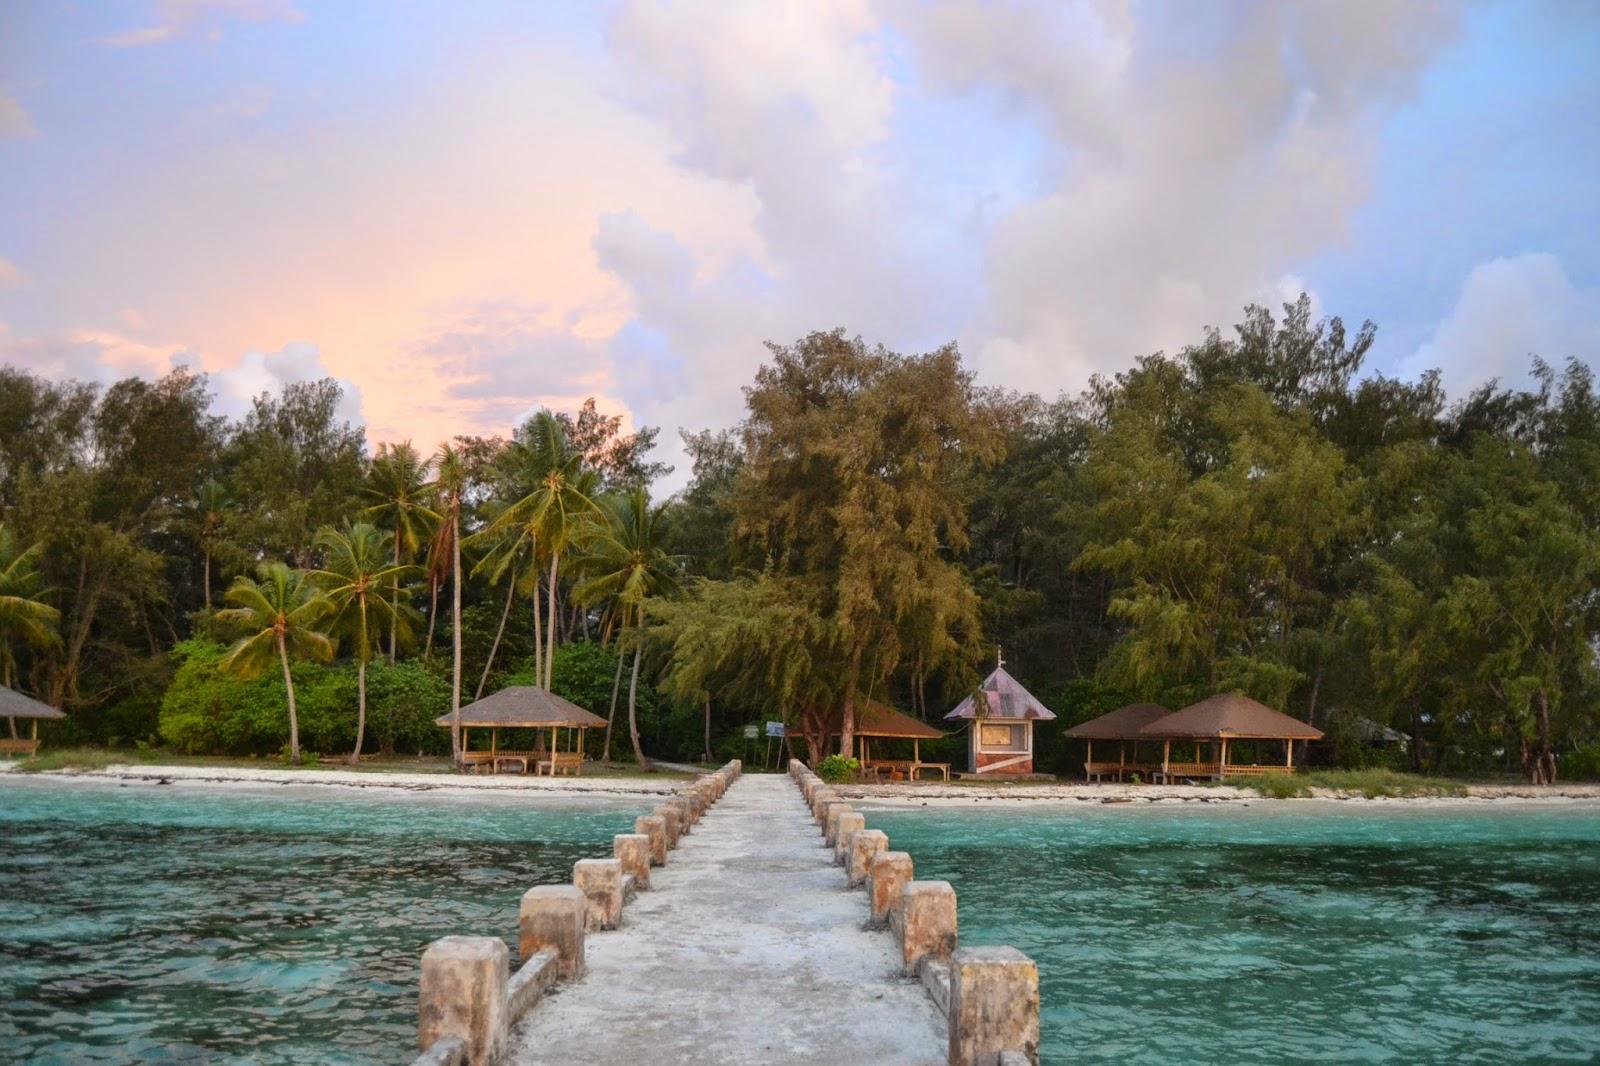 lodging on the island of Hoga